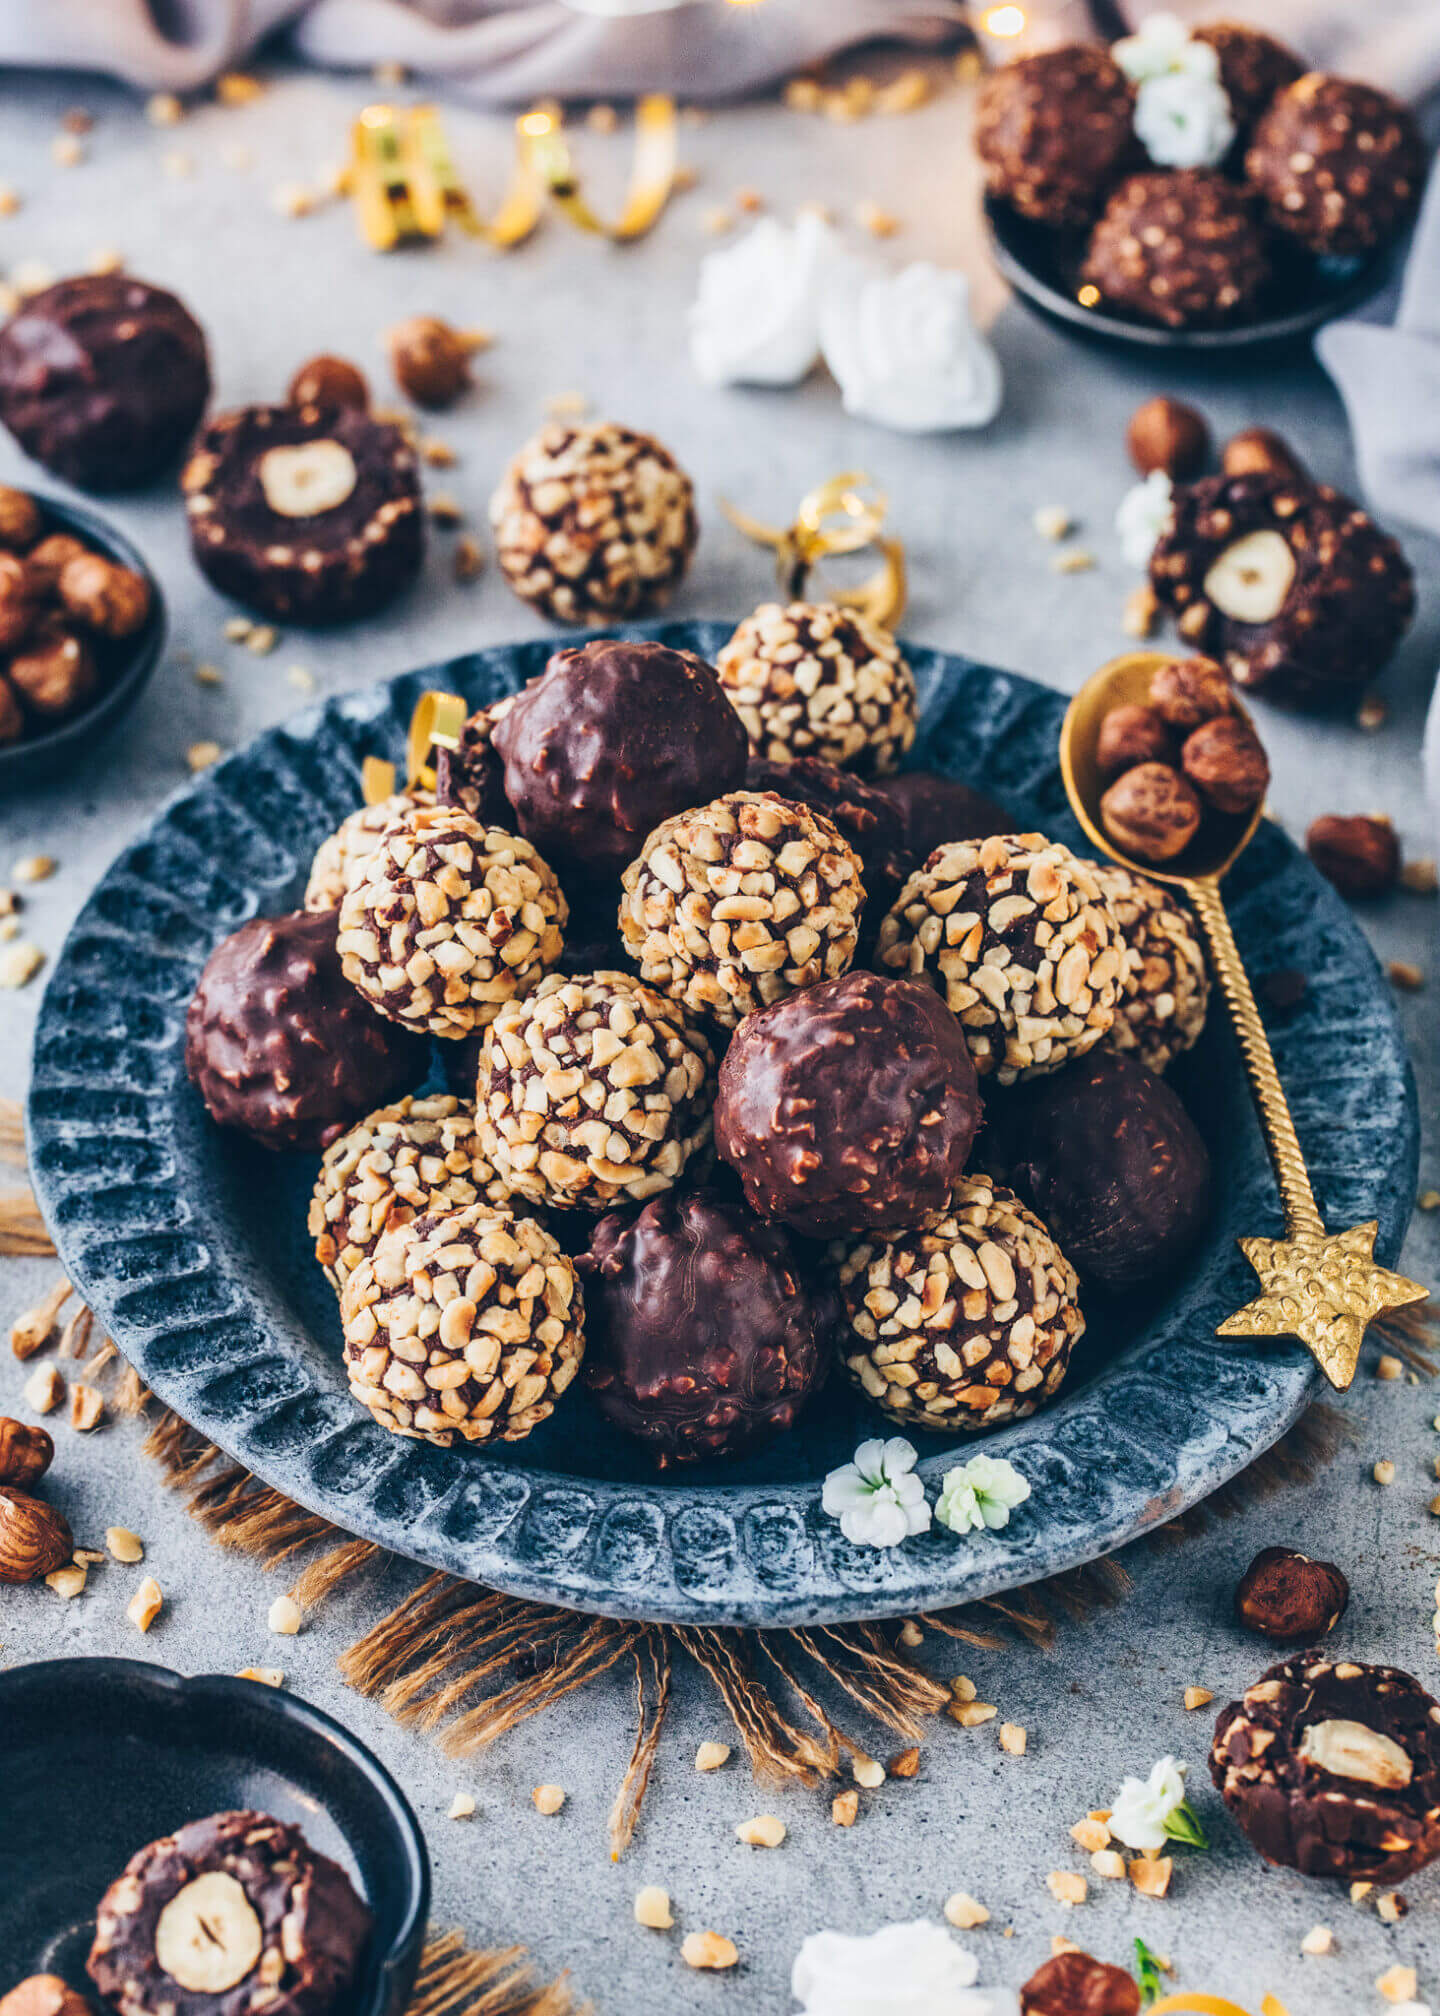 Schoko-Haselnuss-Kugeln, selbstgemachte Schokoladen-Nuss-Pralinen